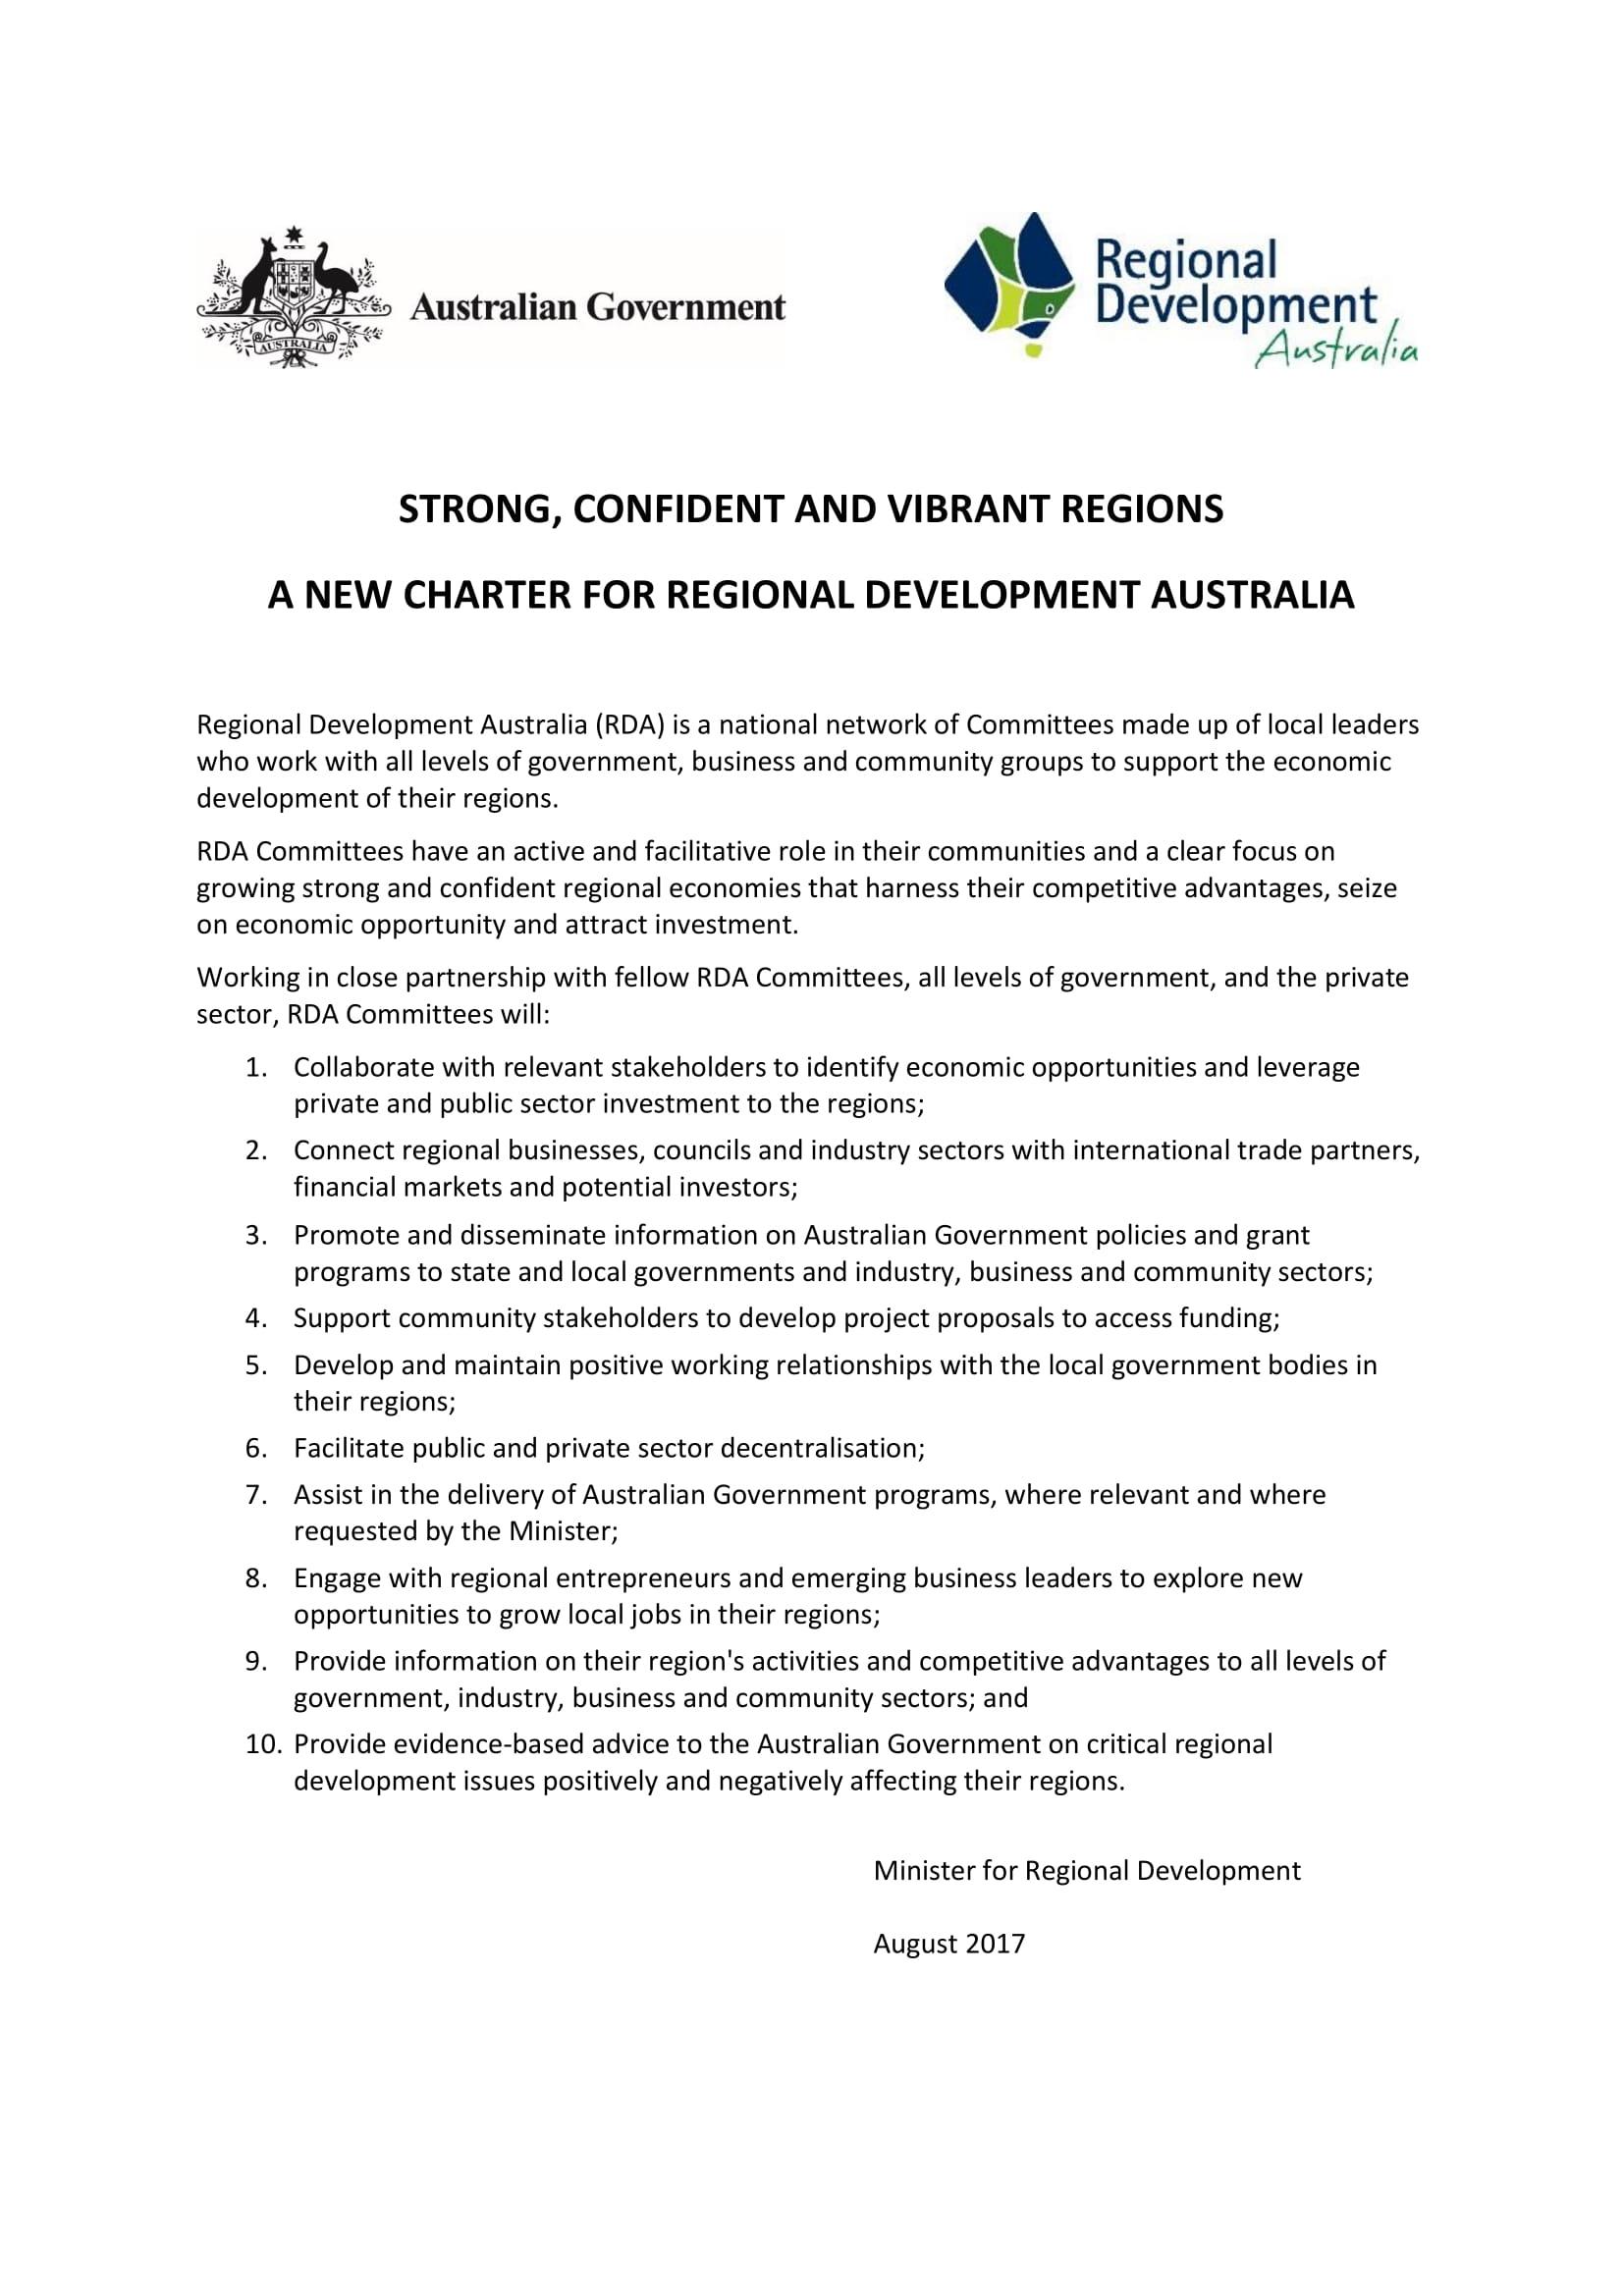 Regional Development Australia Charter